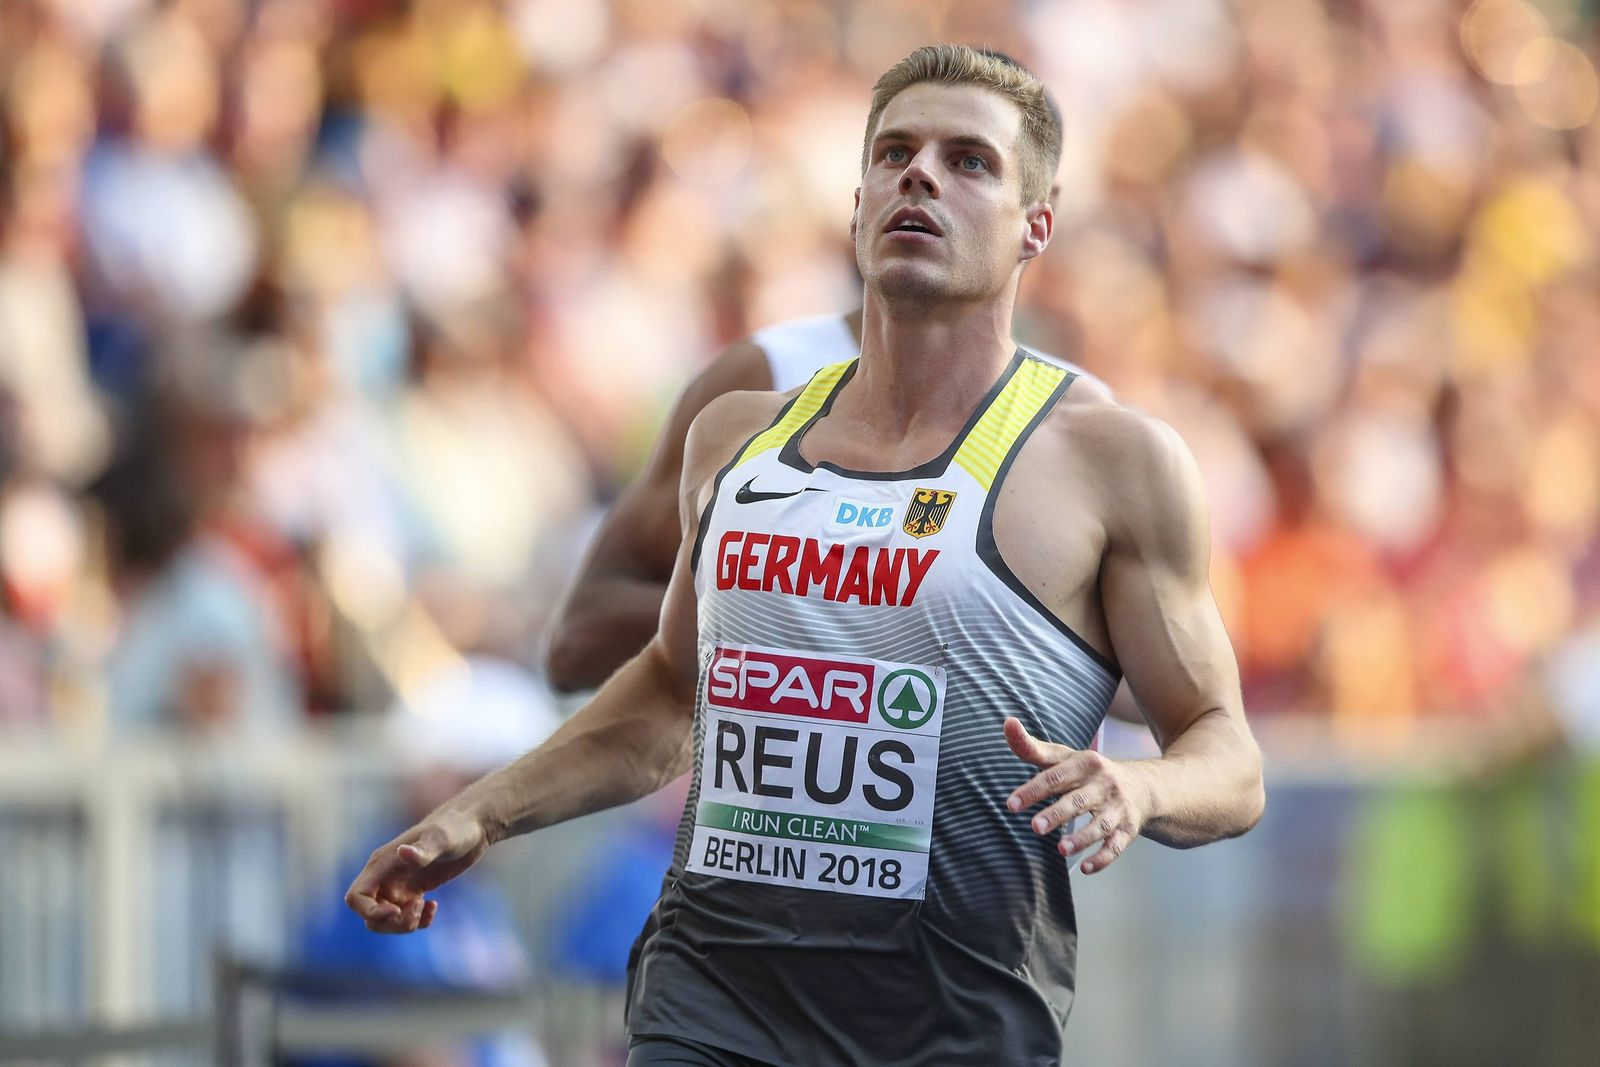 European Athletics Championships Berlin 07 08 2018 Julian Reus GER LAC Erfurt Top Team Europ